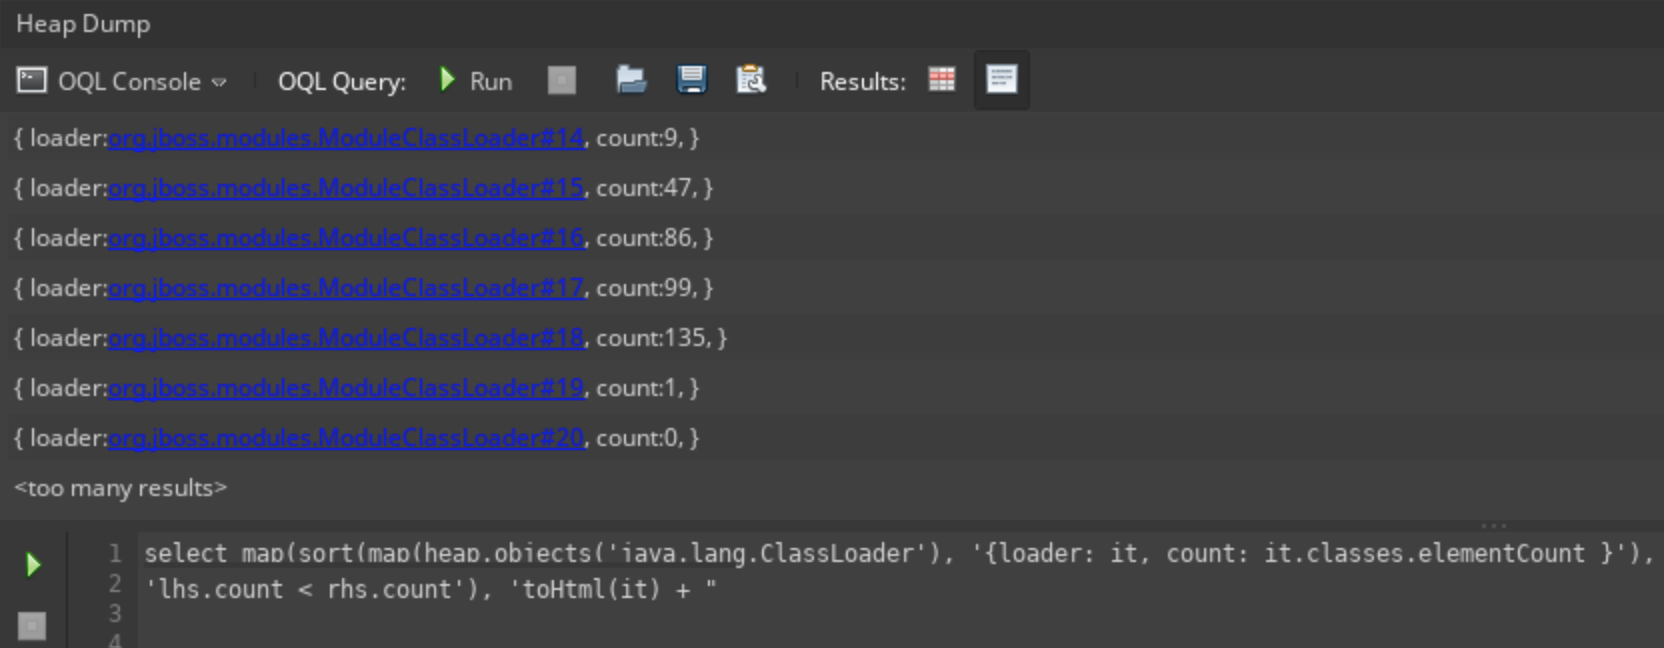 java元空间metaspace内存溢出排查方法总结